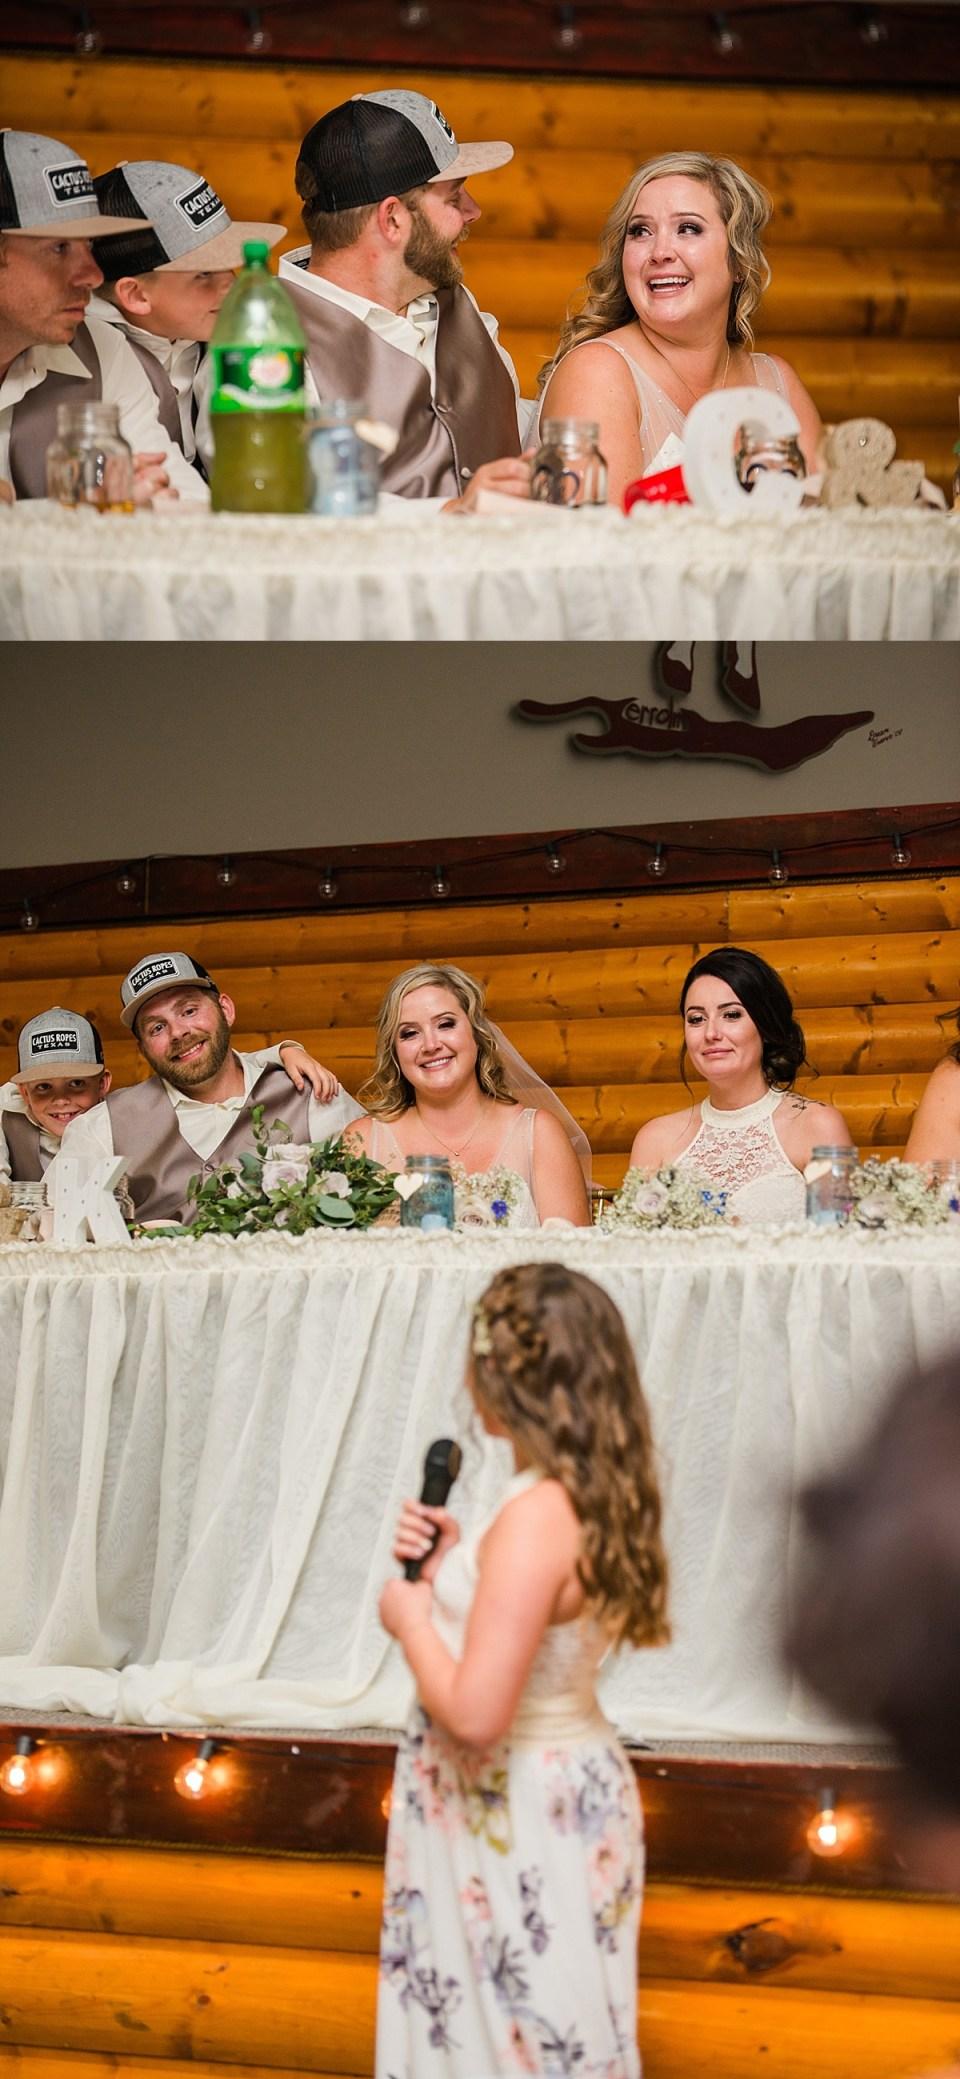 Country Cornfield Wedding | Ponoka Stagecoach Saloon Wedding | Ponoka, Alberta | Red Deer Photographers | Rustic Wedding Ceremony | DIY Wedding Arch